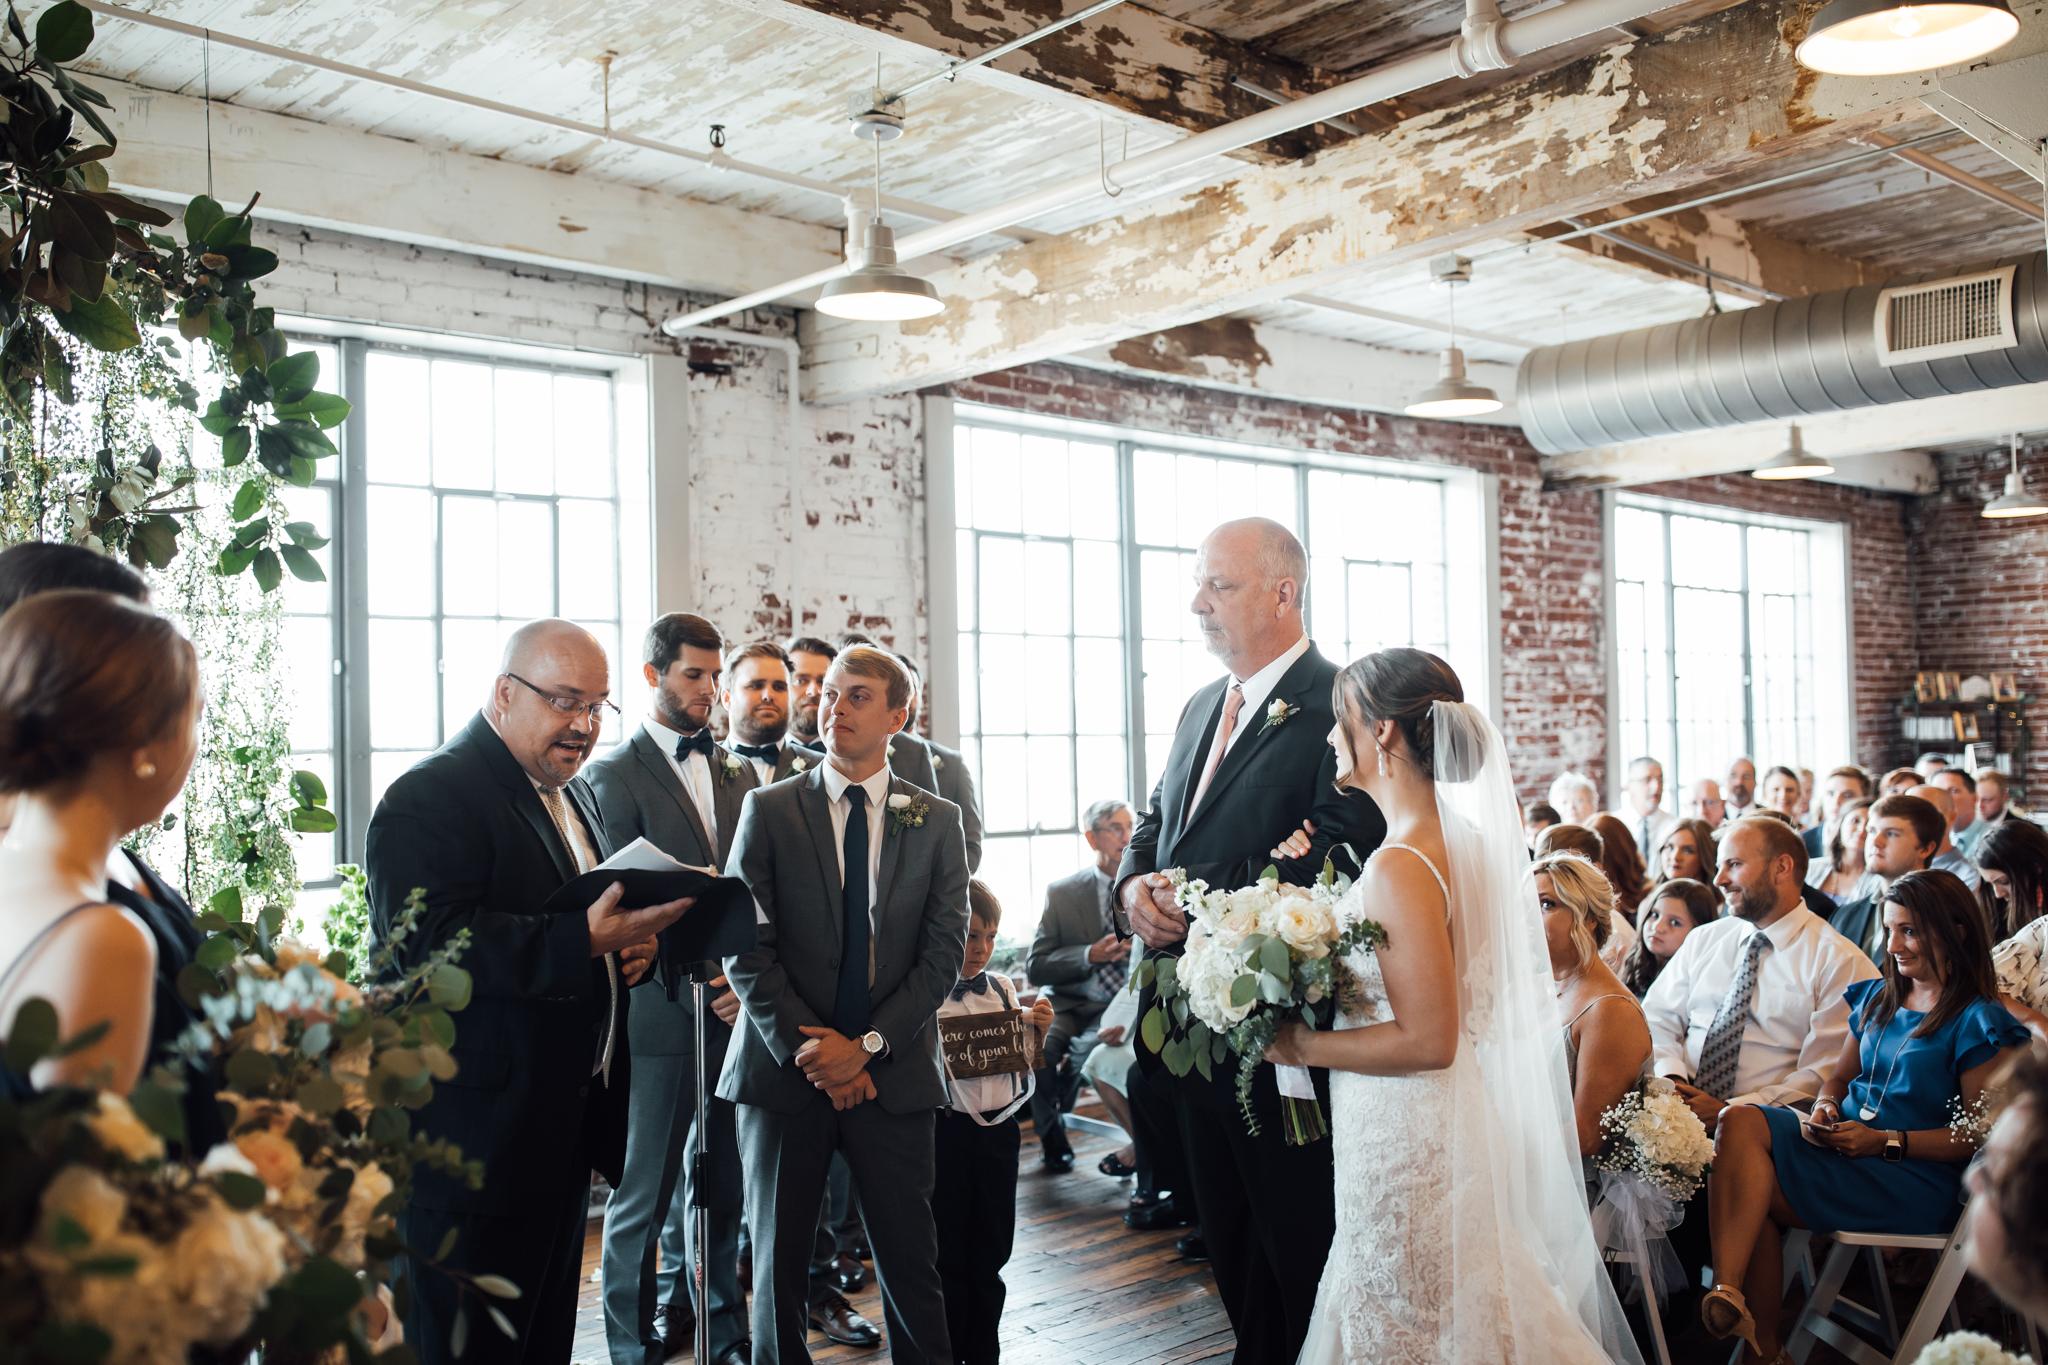 409smain-downtown-memphis-wedding-venue-thewarmtharoundyou (89 of 243).jpg